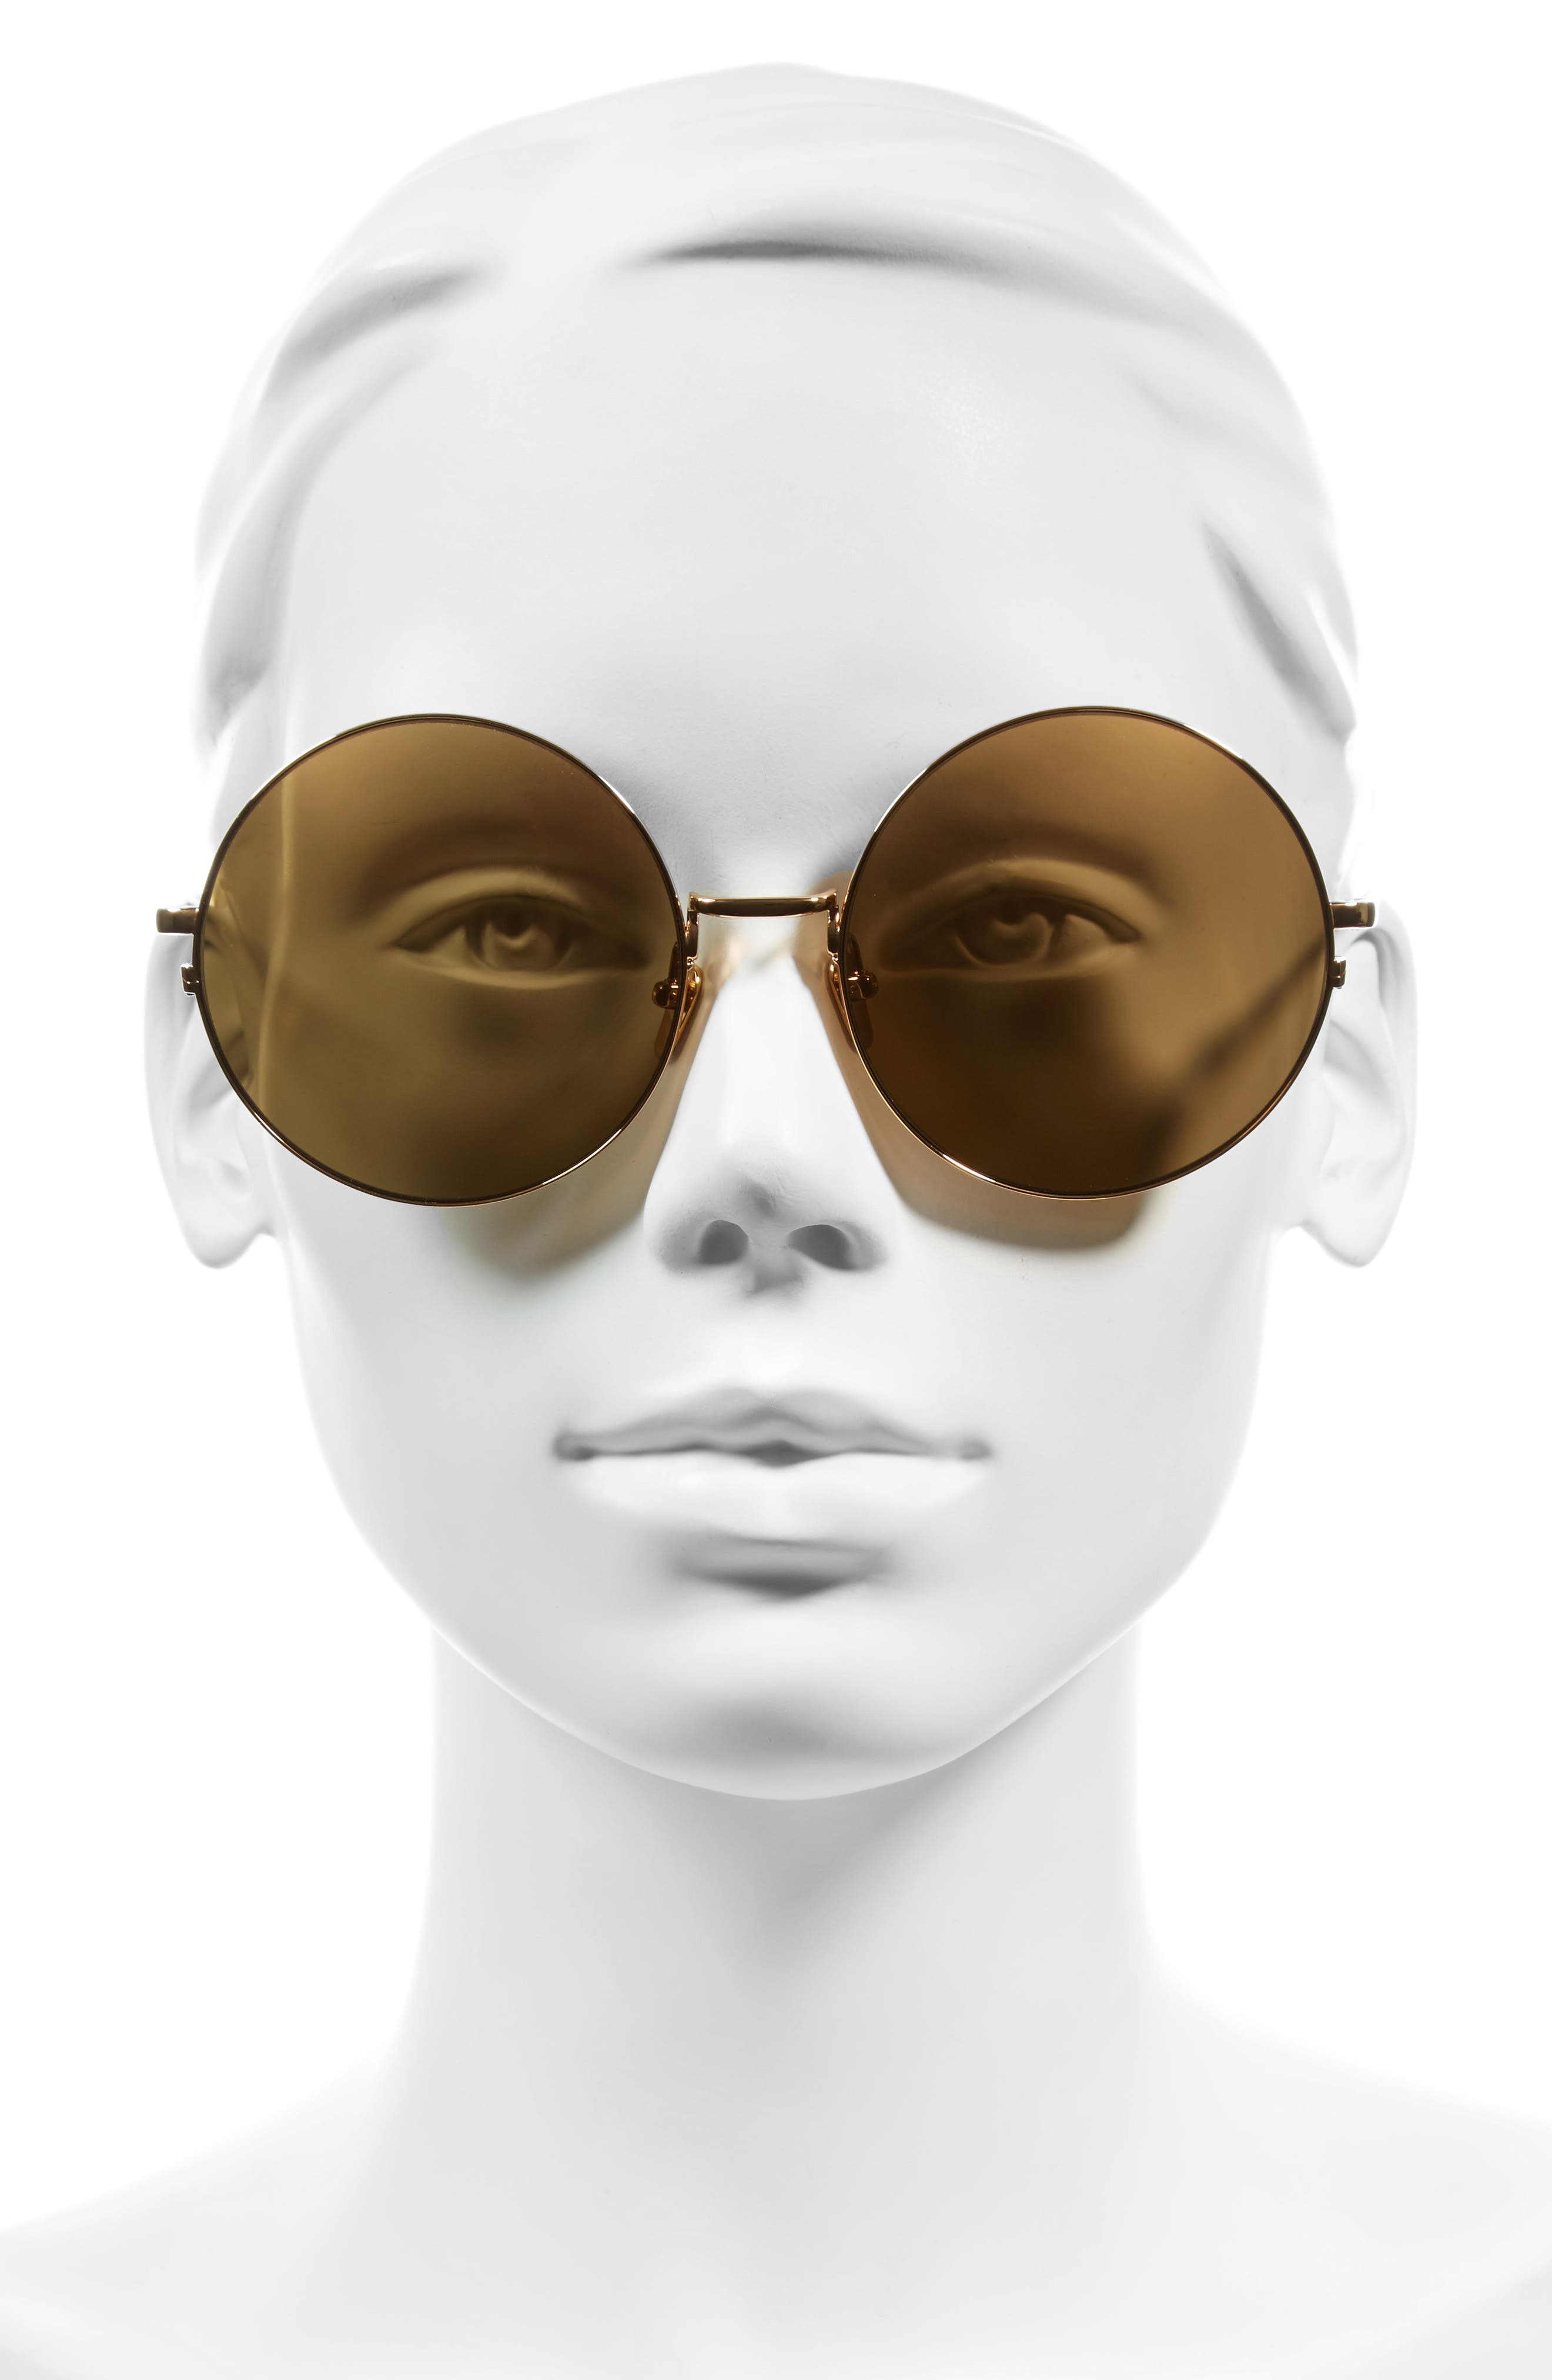 58mm 22 Karat Gold Trim Sunglasses,                             Alternate thumbnail 2, color,                             Yellow Gold/ Gold